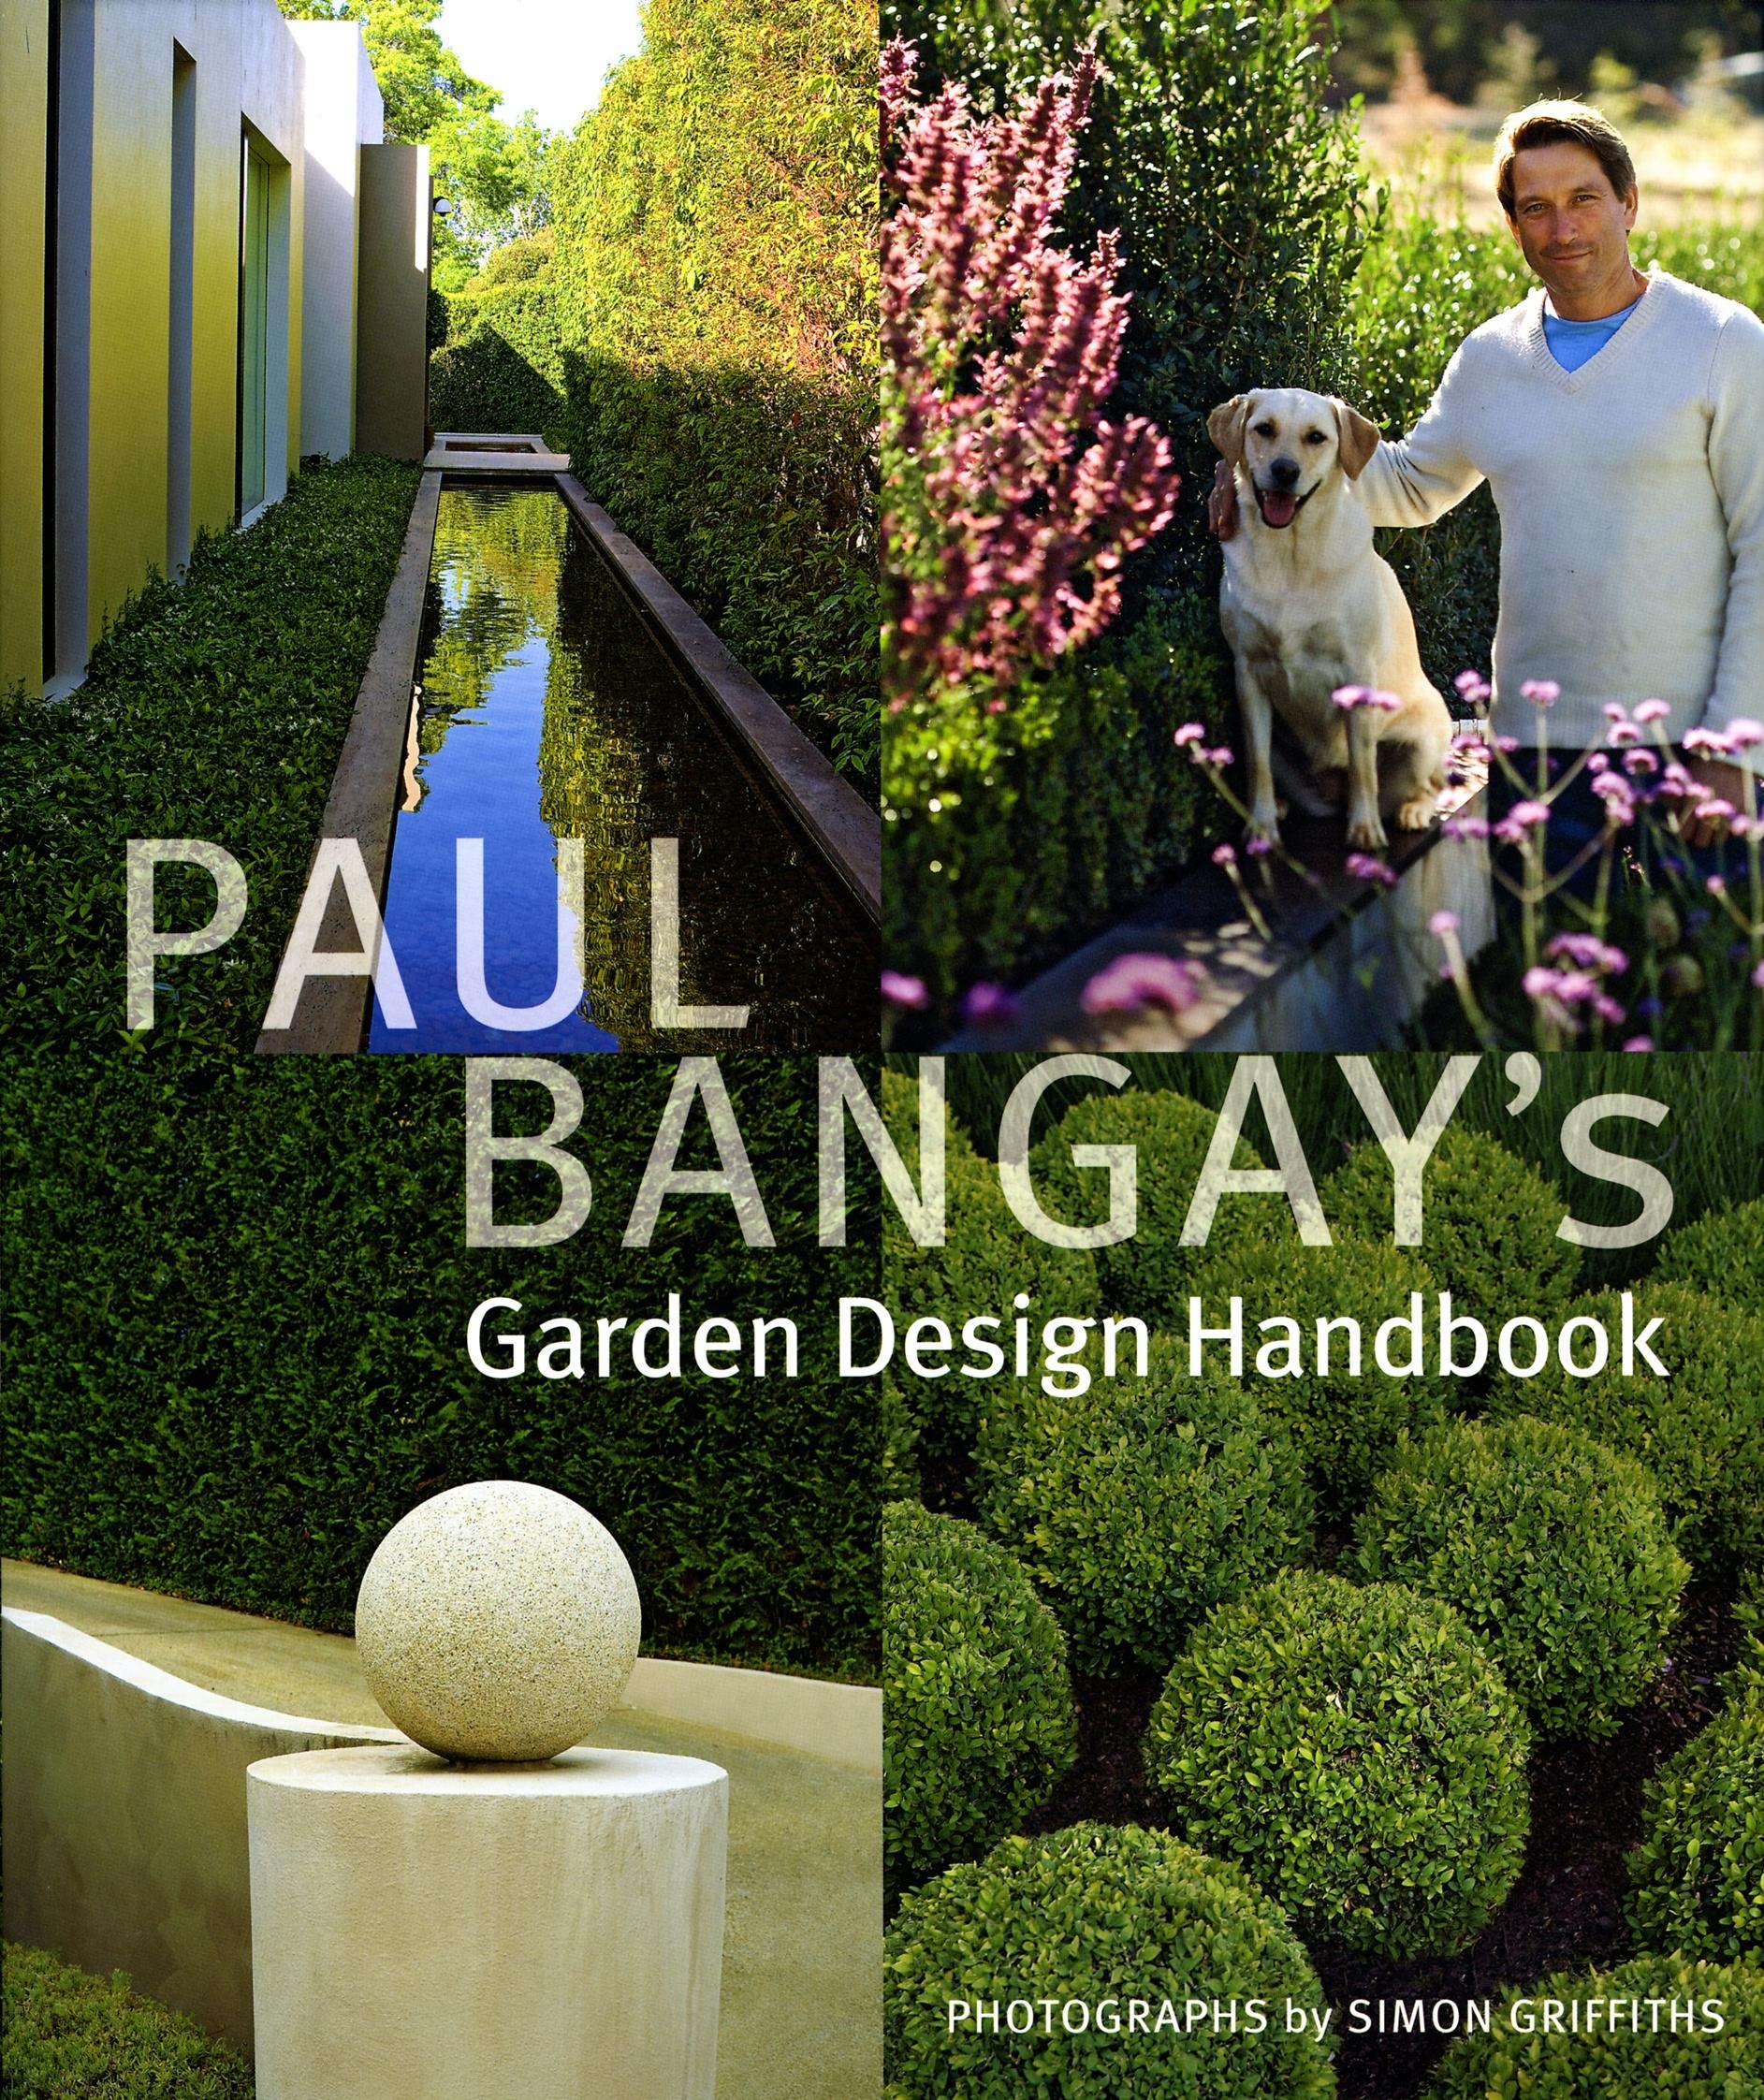 Paul Bangay's Garden Design Handbook | Penguin Books Australia